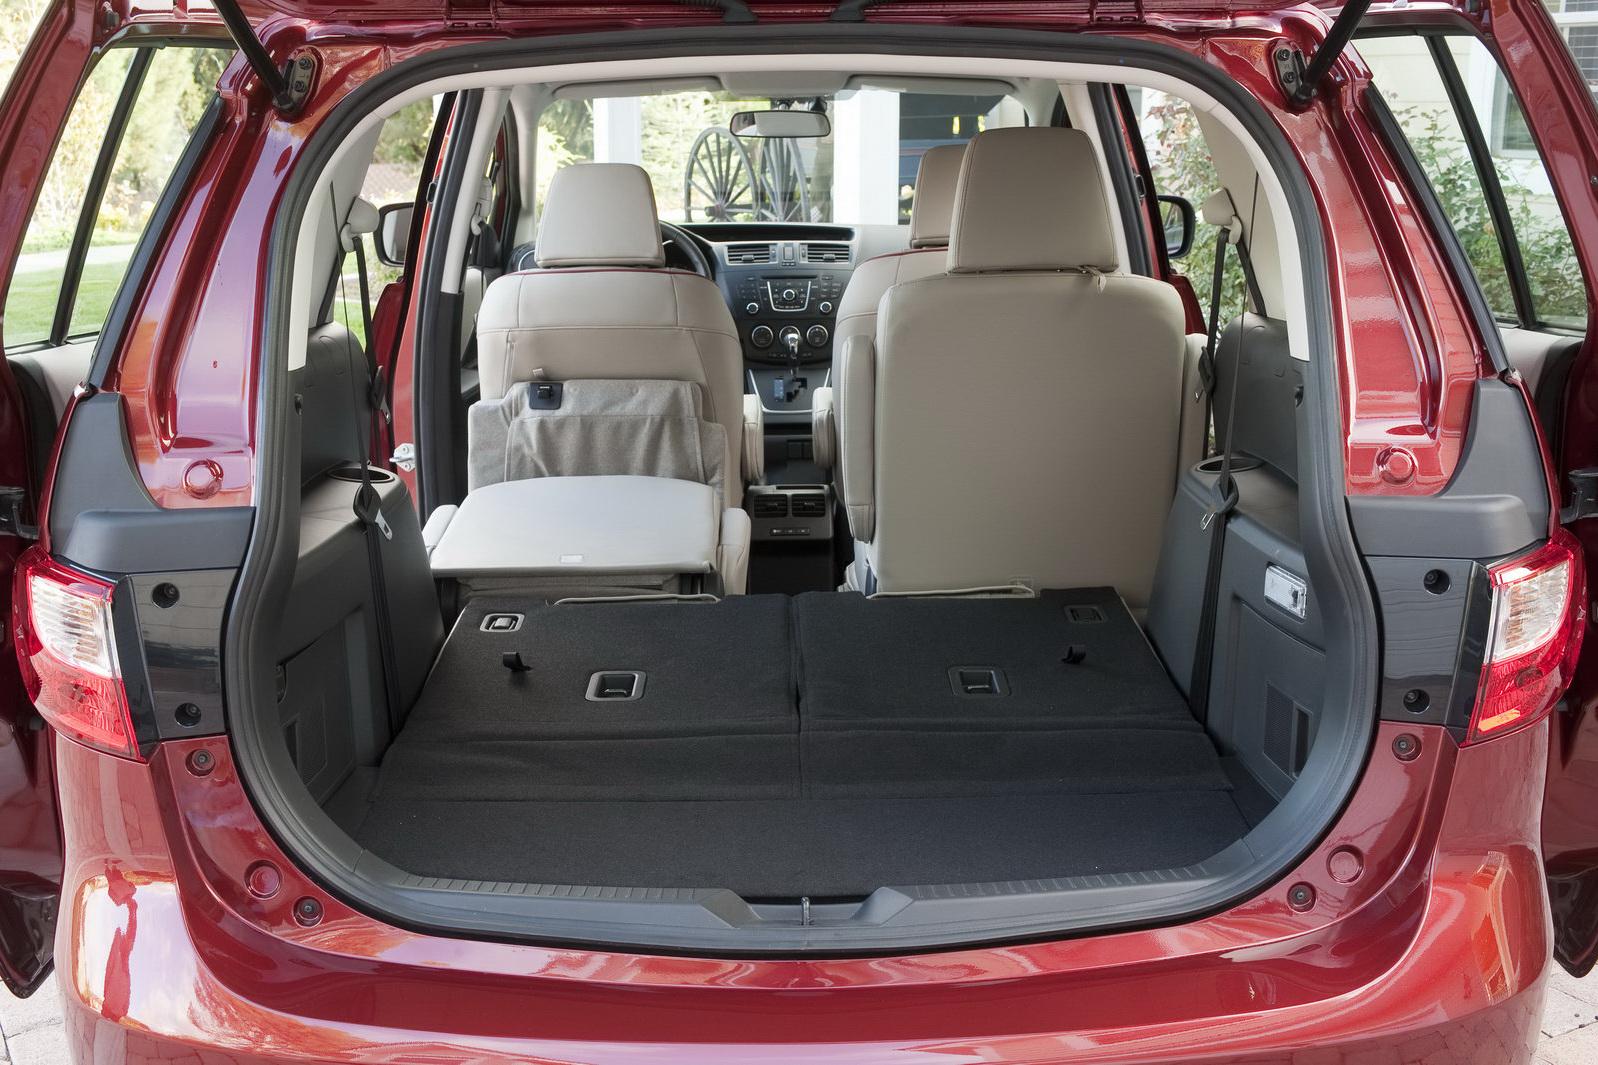 2012 Mazda5 Minivan Starts At Under 20 000 Autoevolution